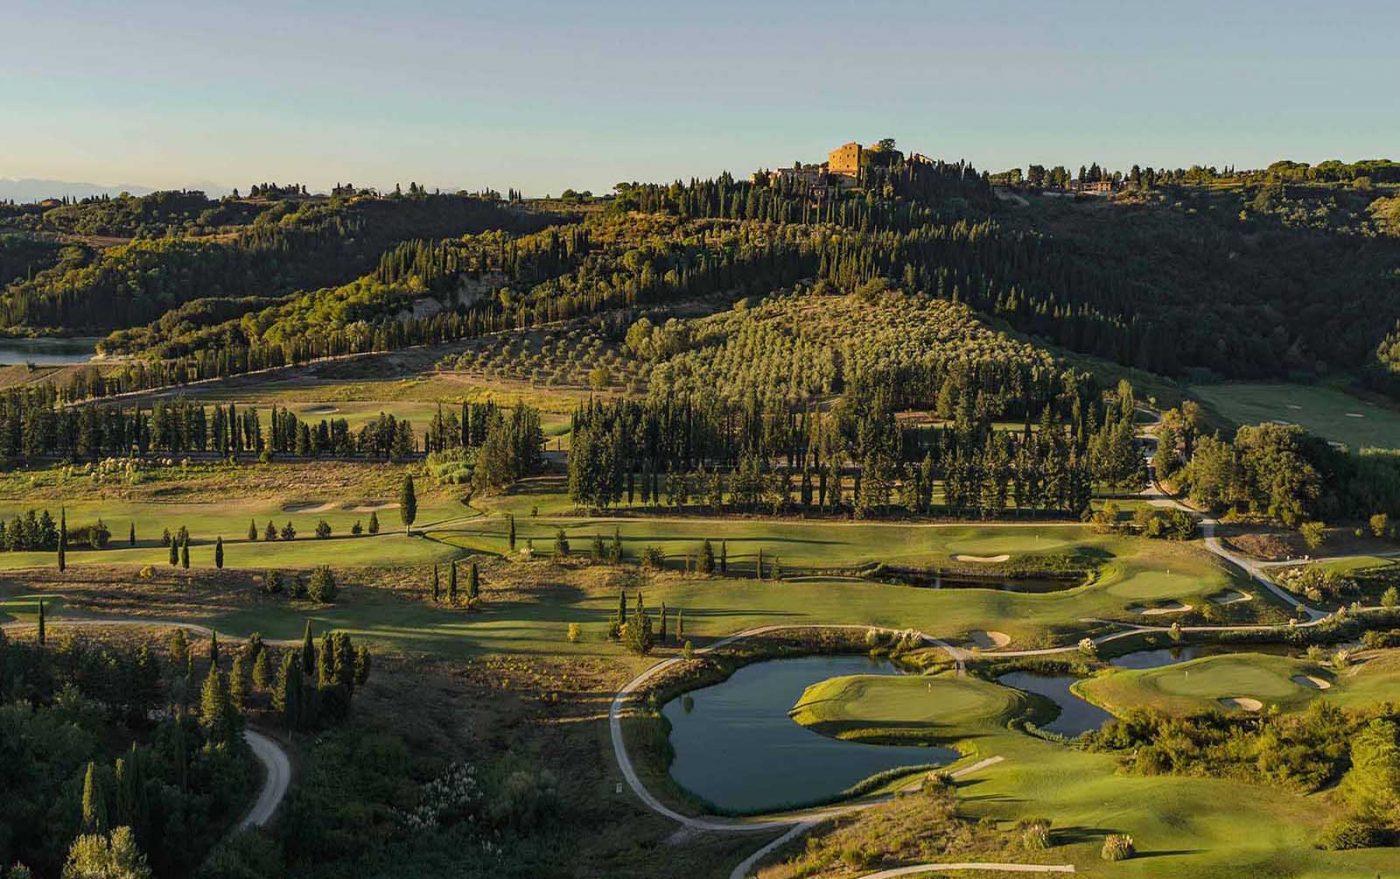 castelfalfi-golf-club-experience-italy4golf